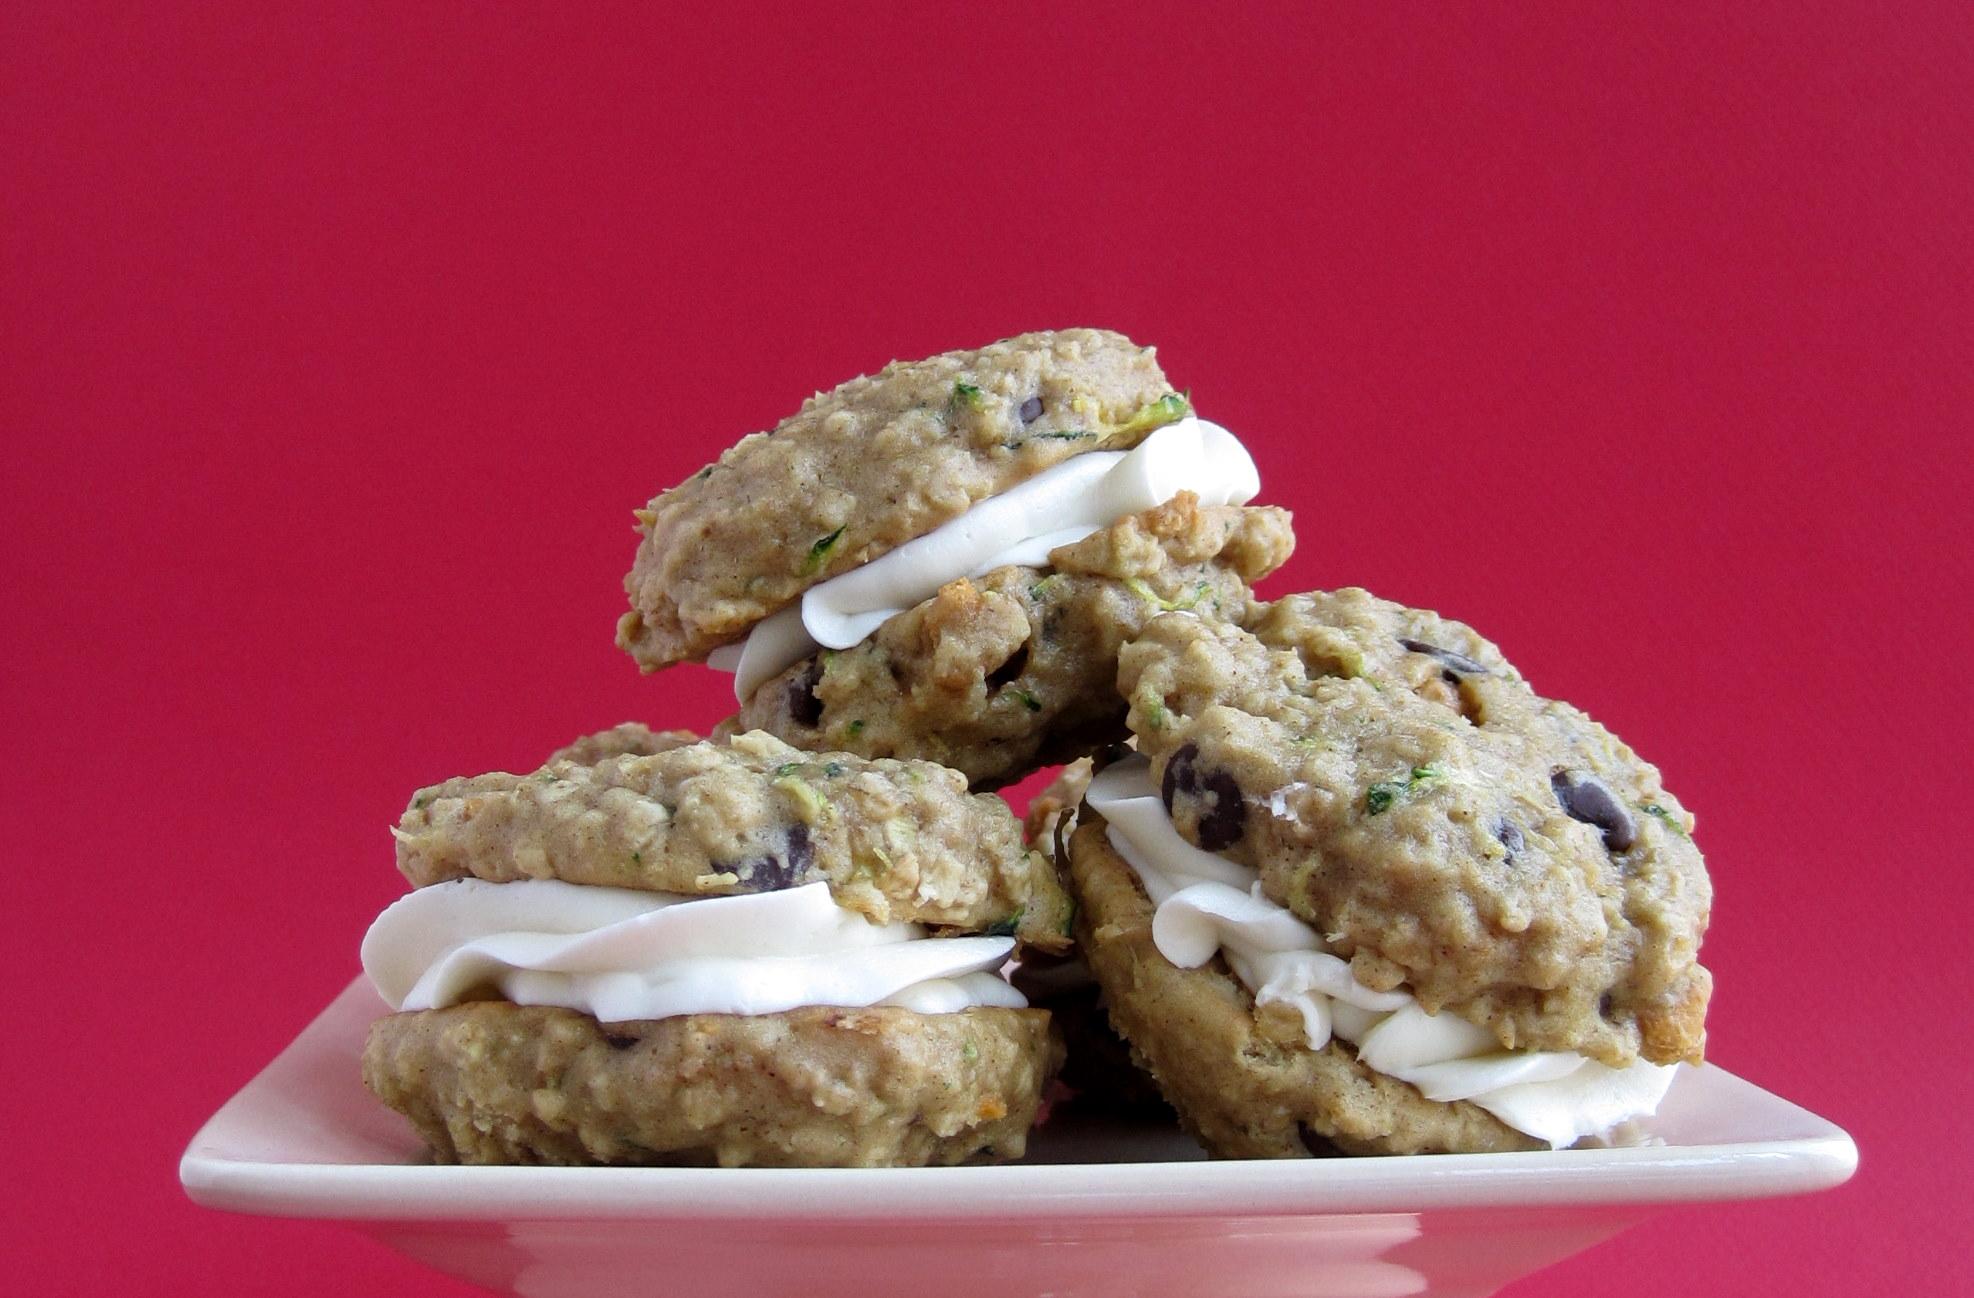 Oatmeal Zucchini Cookies | Baking with Basil